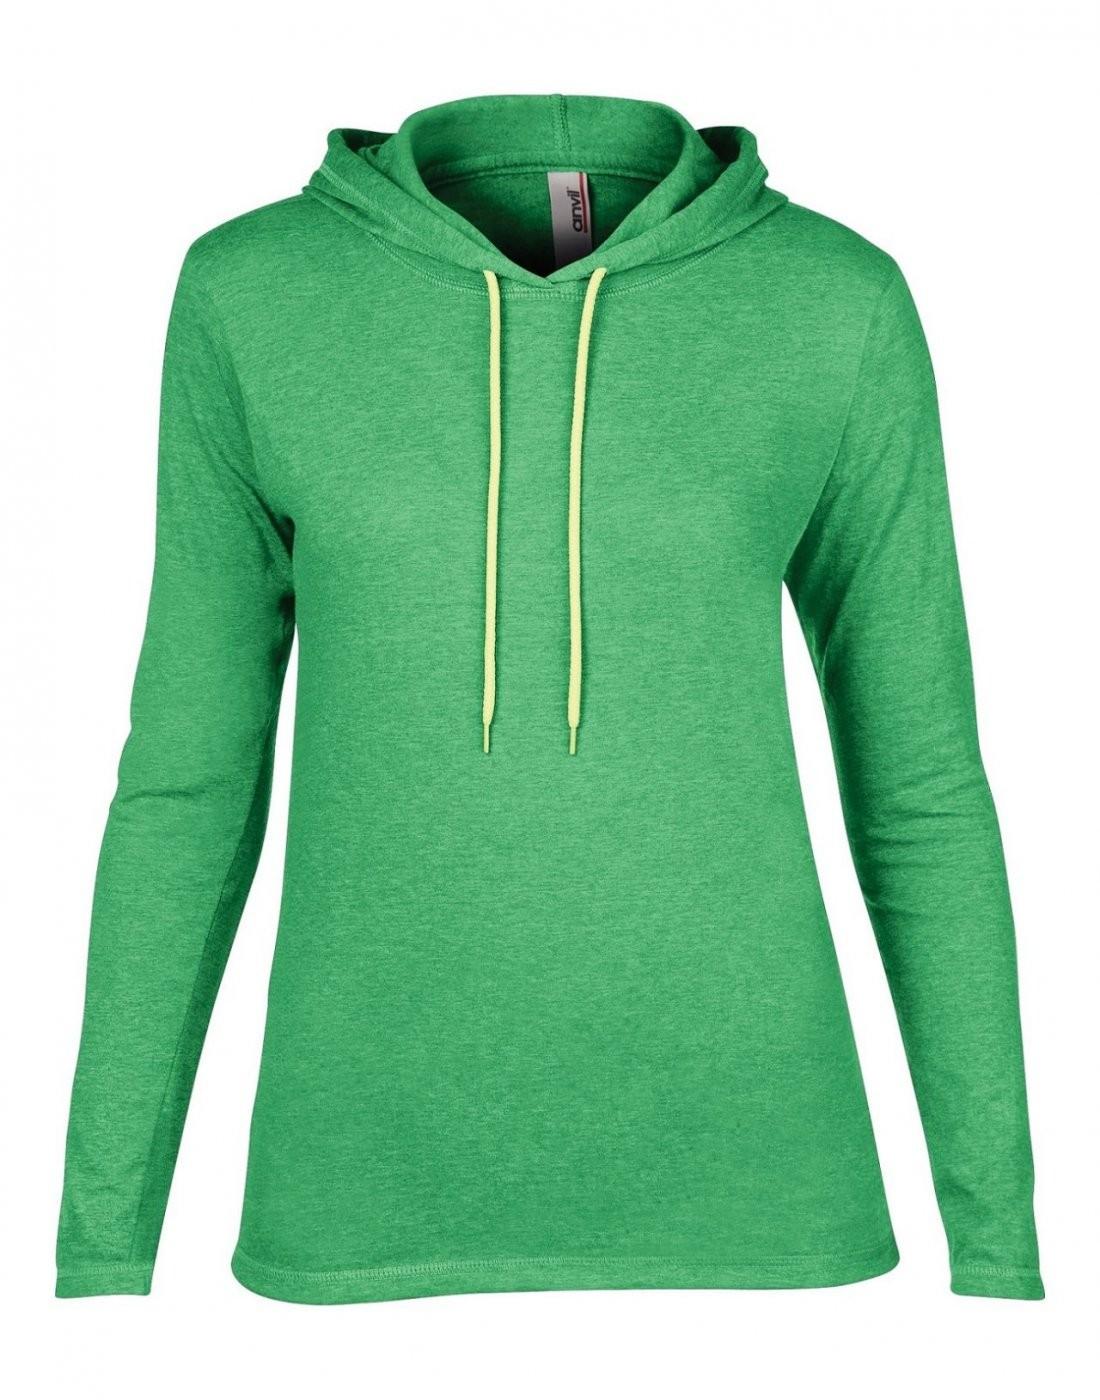 9355180f7f07 Personalised Anvil Women s Fashion Basic Long Sleeve Hooded Tee ...